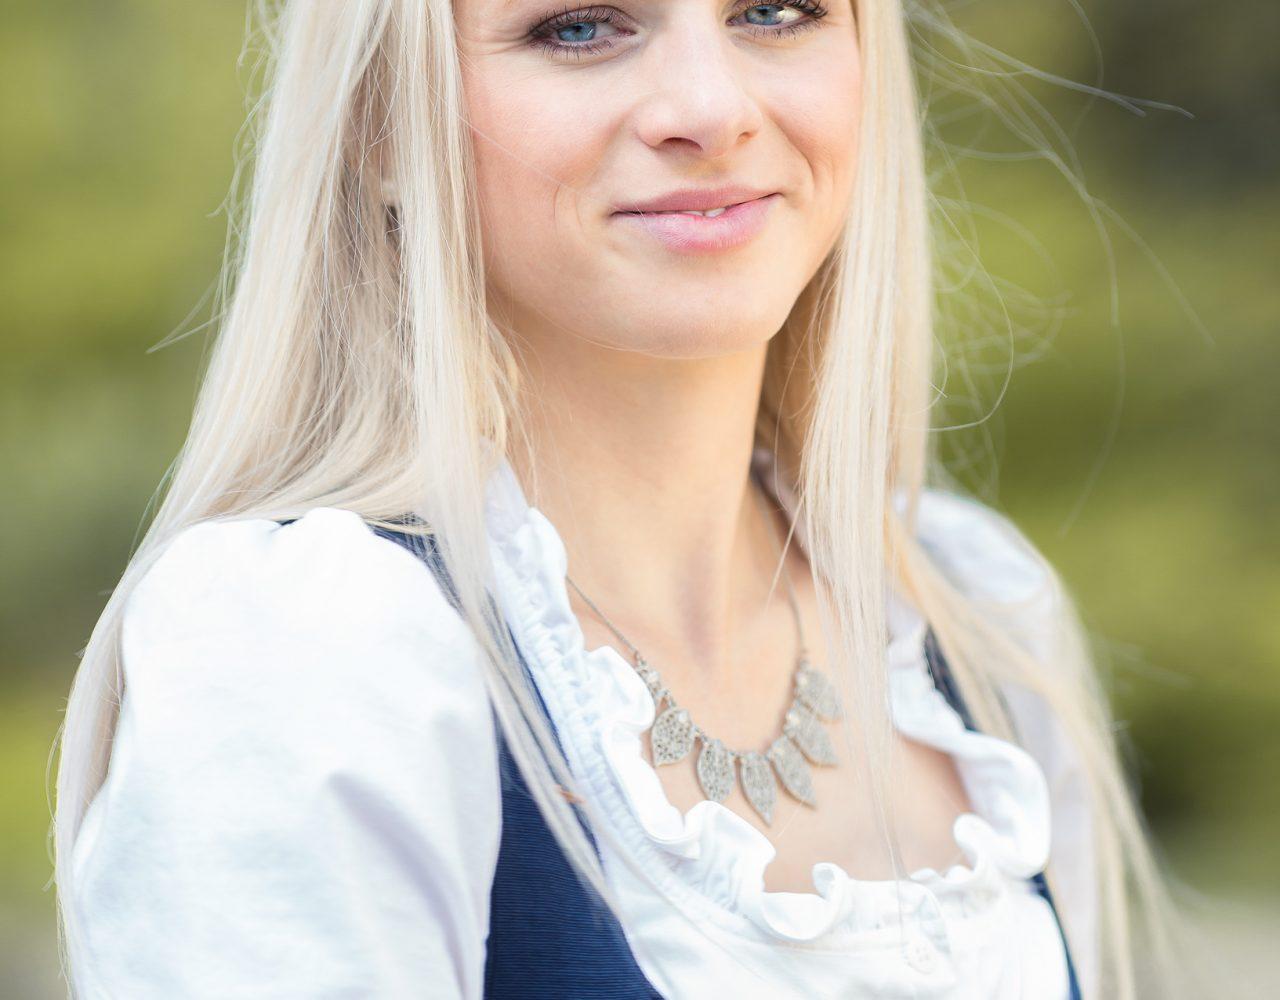 Mensch_Portrait